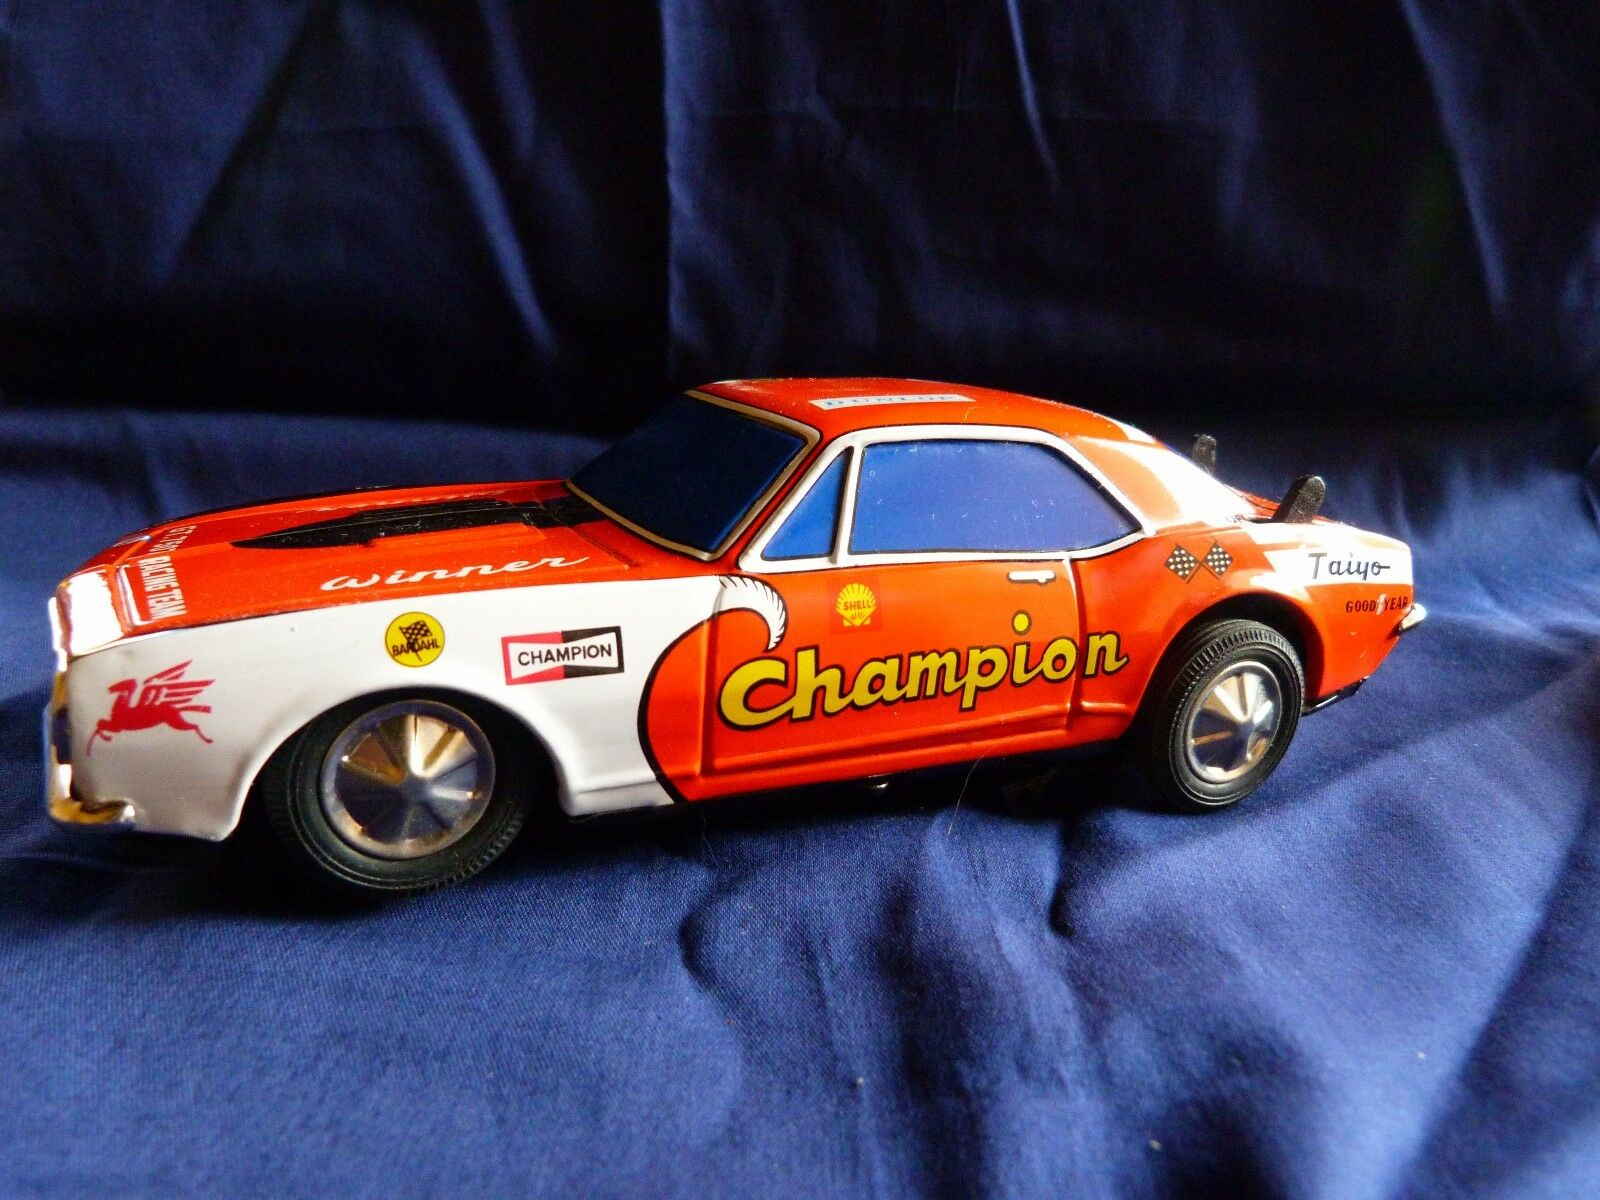 Taiyo Japon 1970 - The racer Chevrolet Camaro